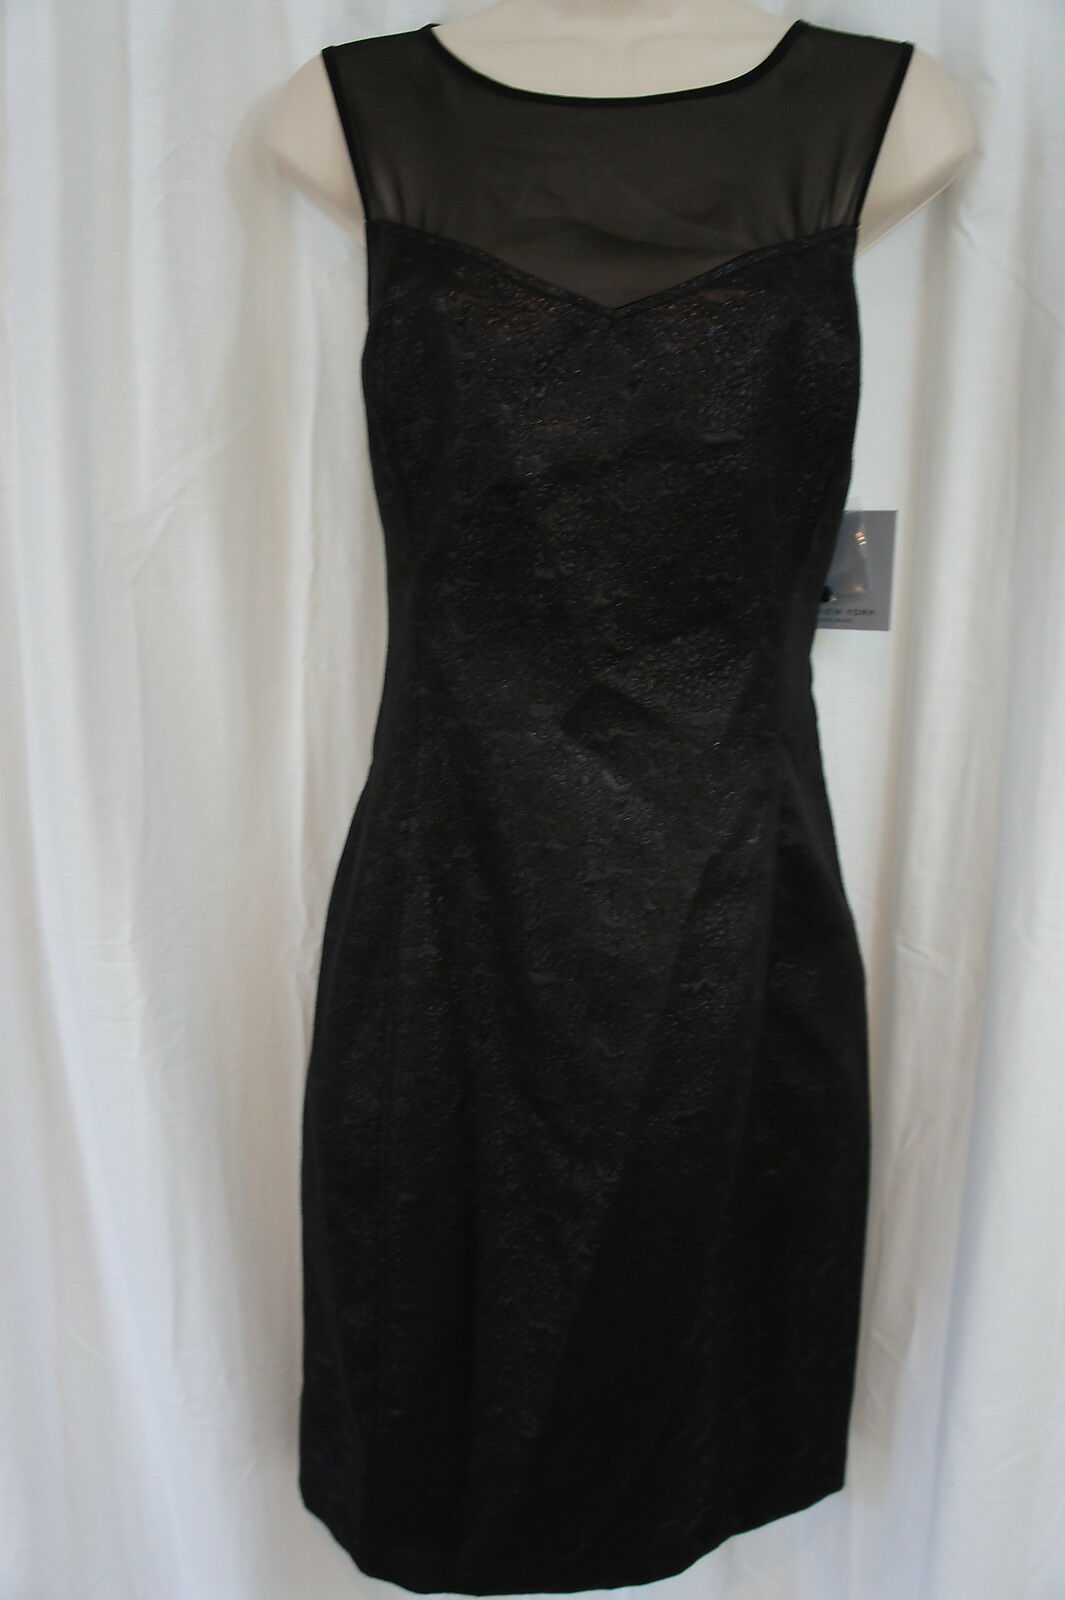 Marc New York Dress Sz 8 schwarz Sheer Cocktail Fete Soiree petite robe schwarze